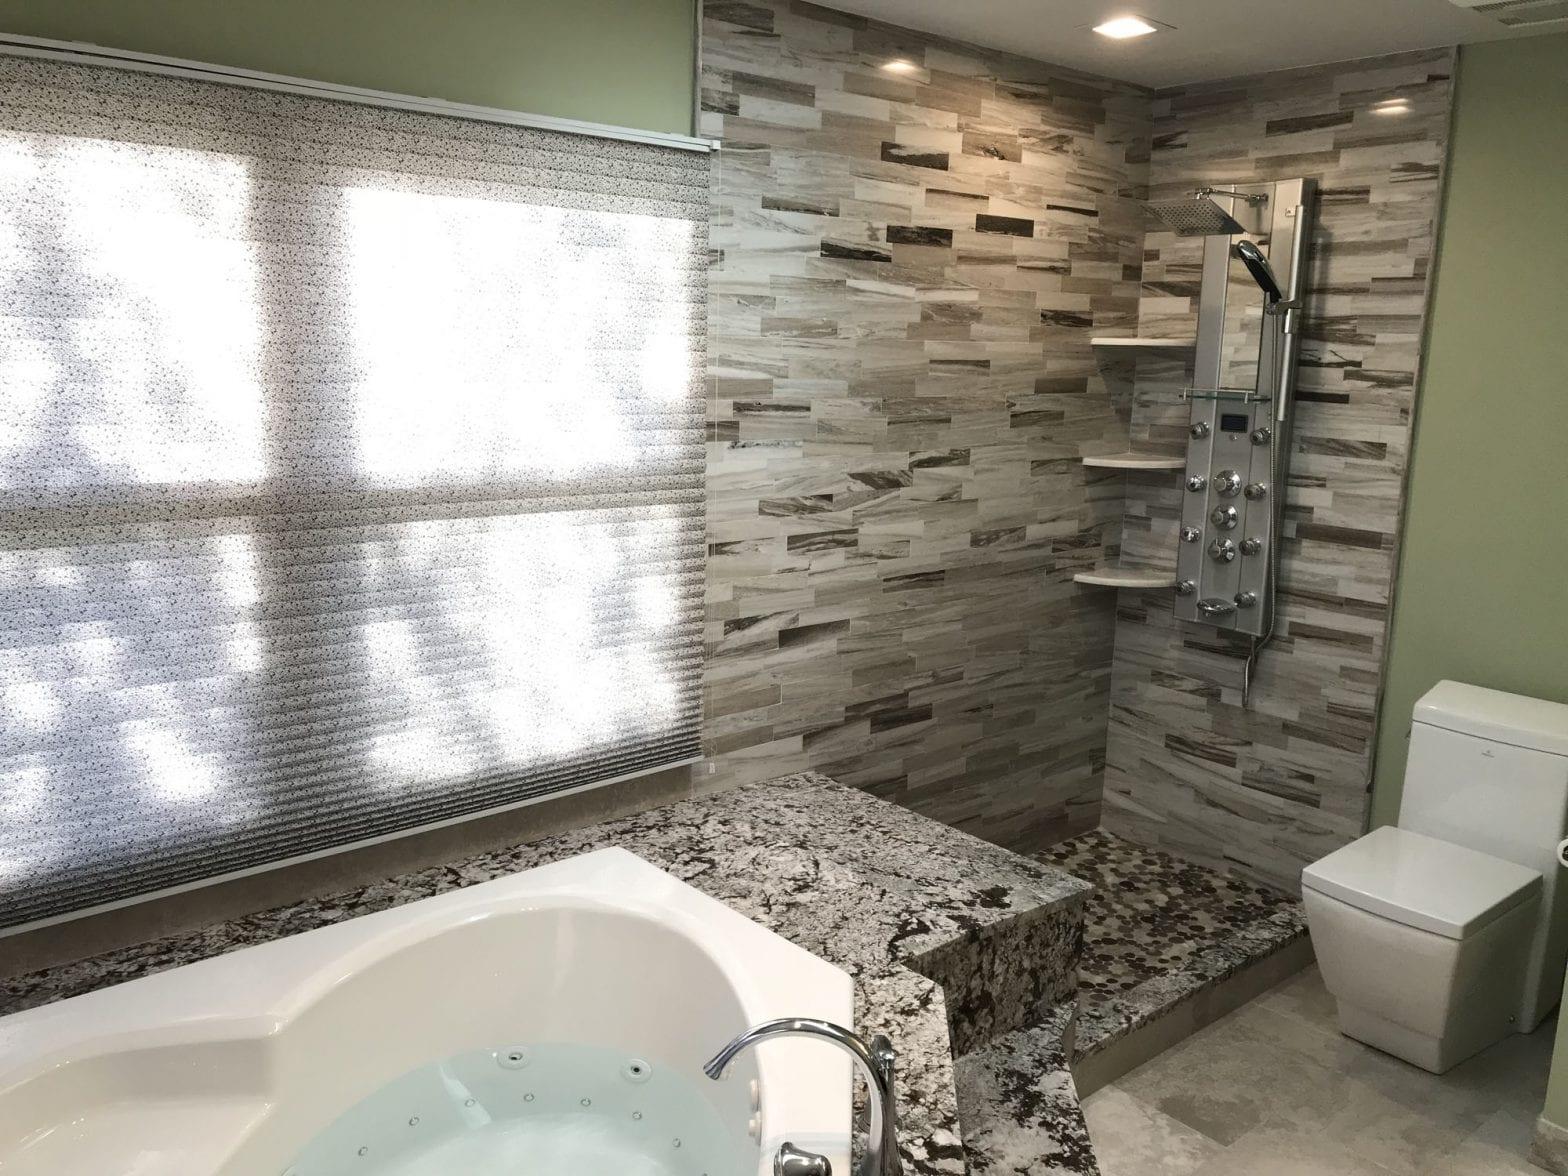 Master Bathroom Remodeling In Hoffman Estates - granite countertops modern shower